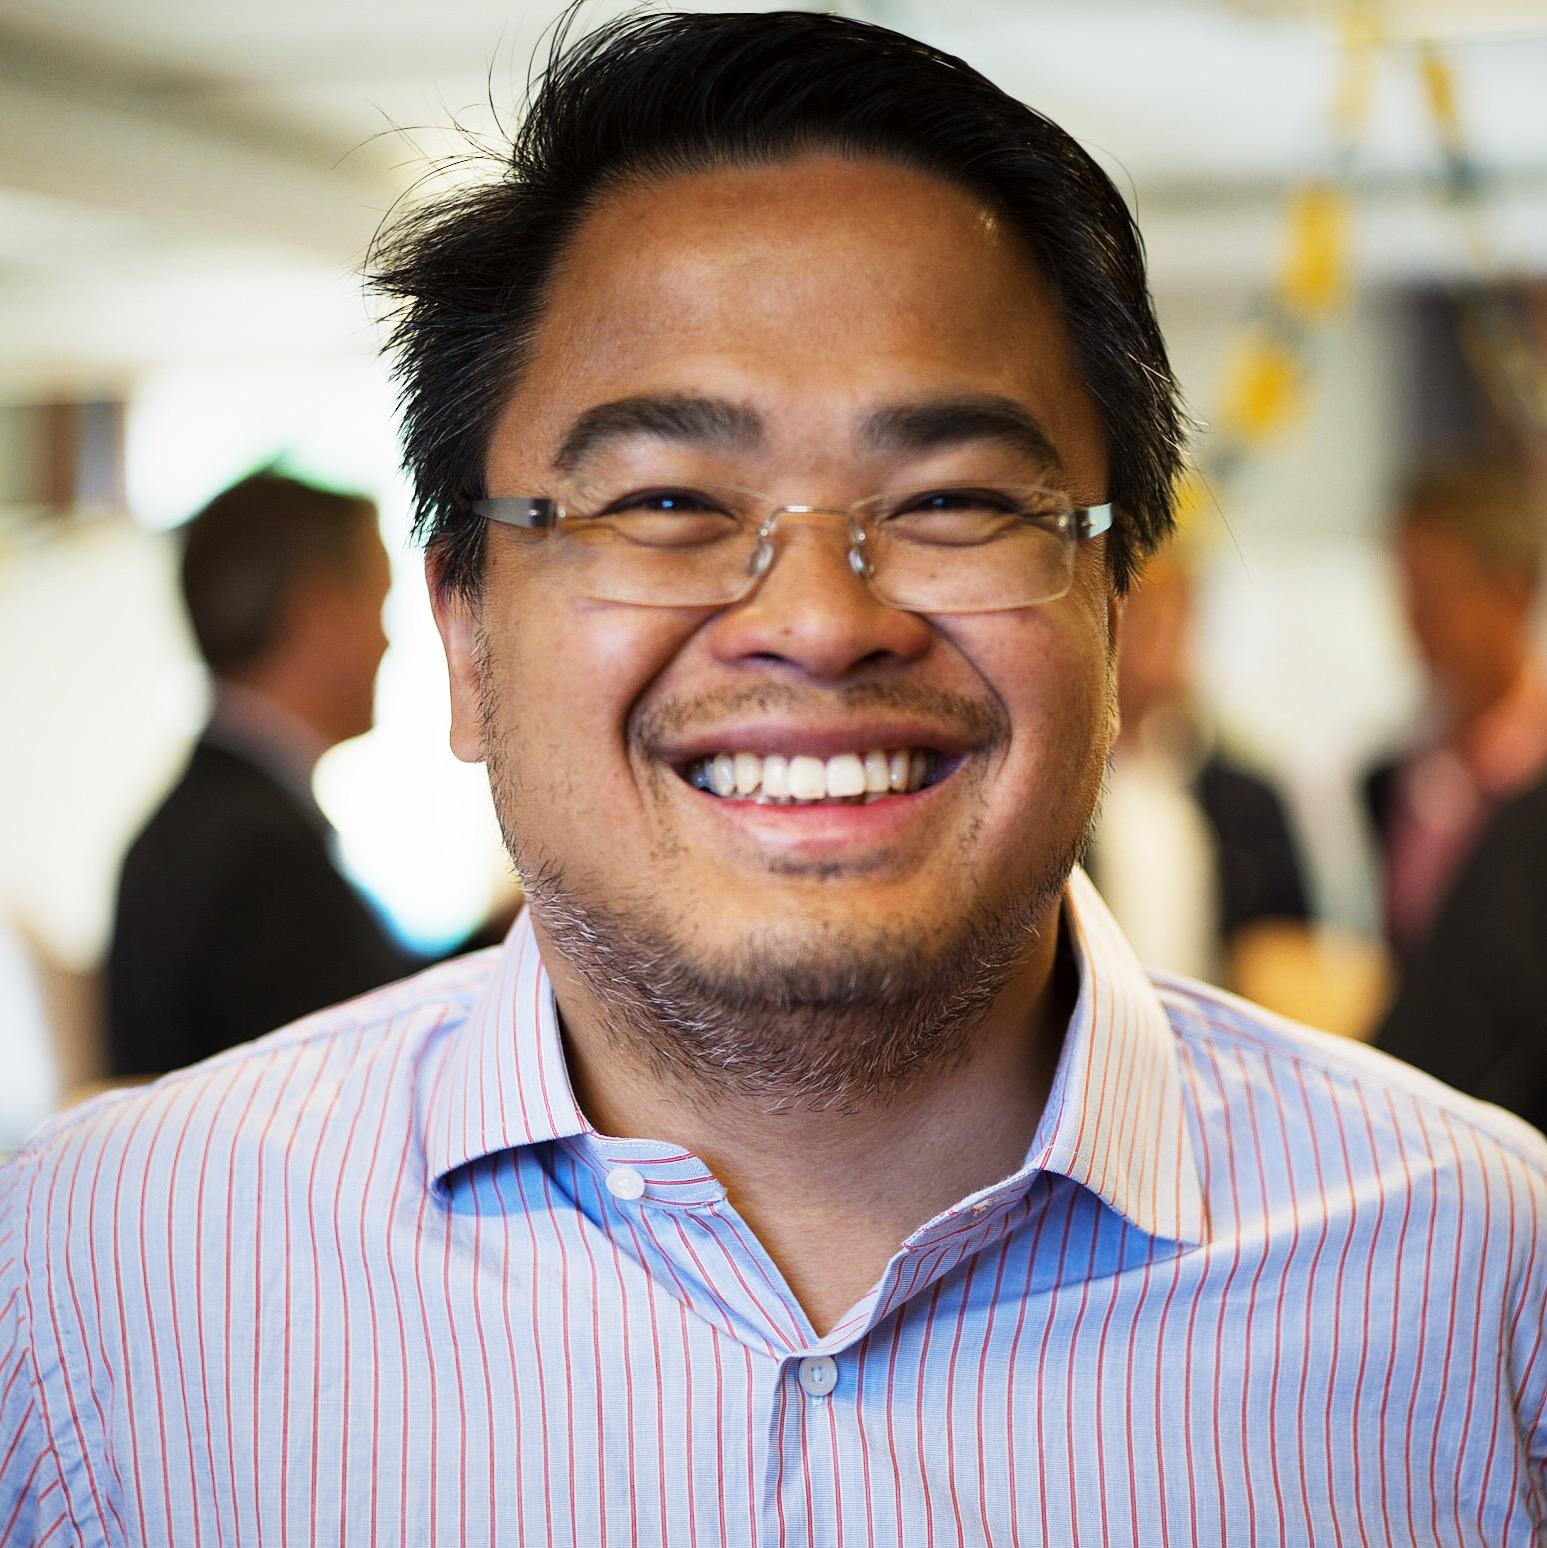 Marcus Cristenson   Automotive Consultant & Contractor   linkedin  |  twitter  |  kik  |  snap  |  keybase